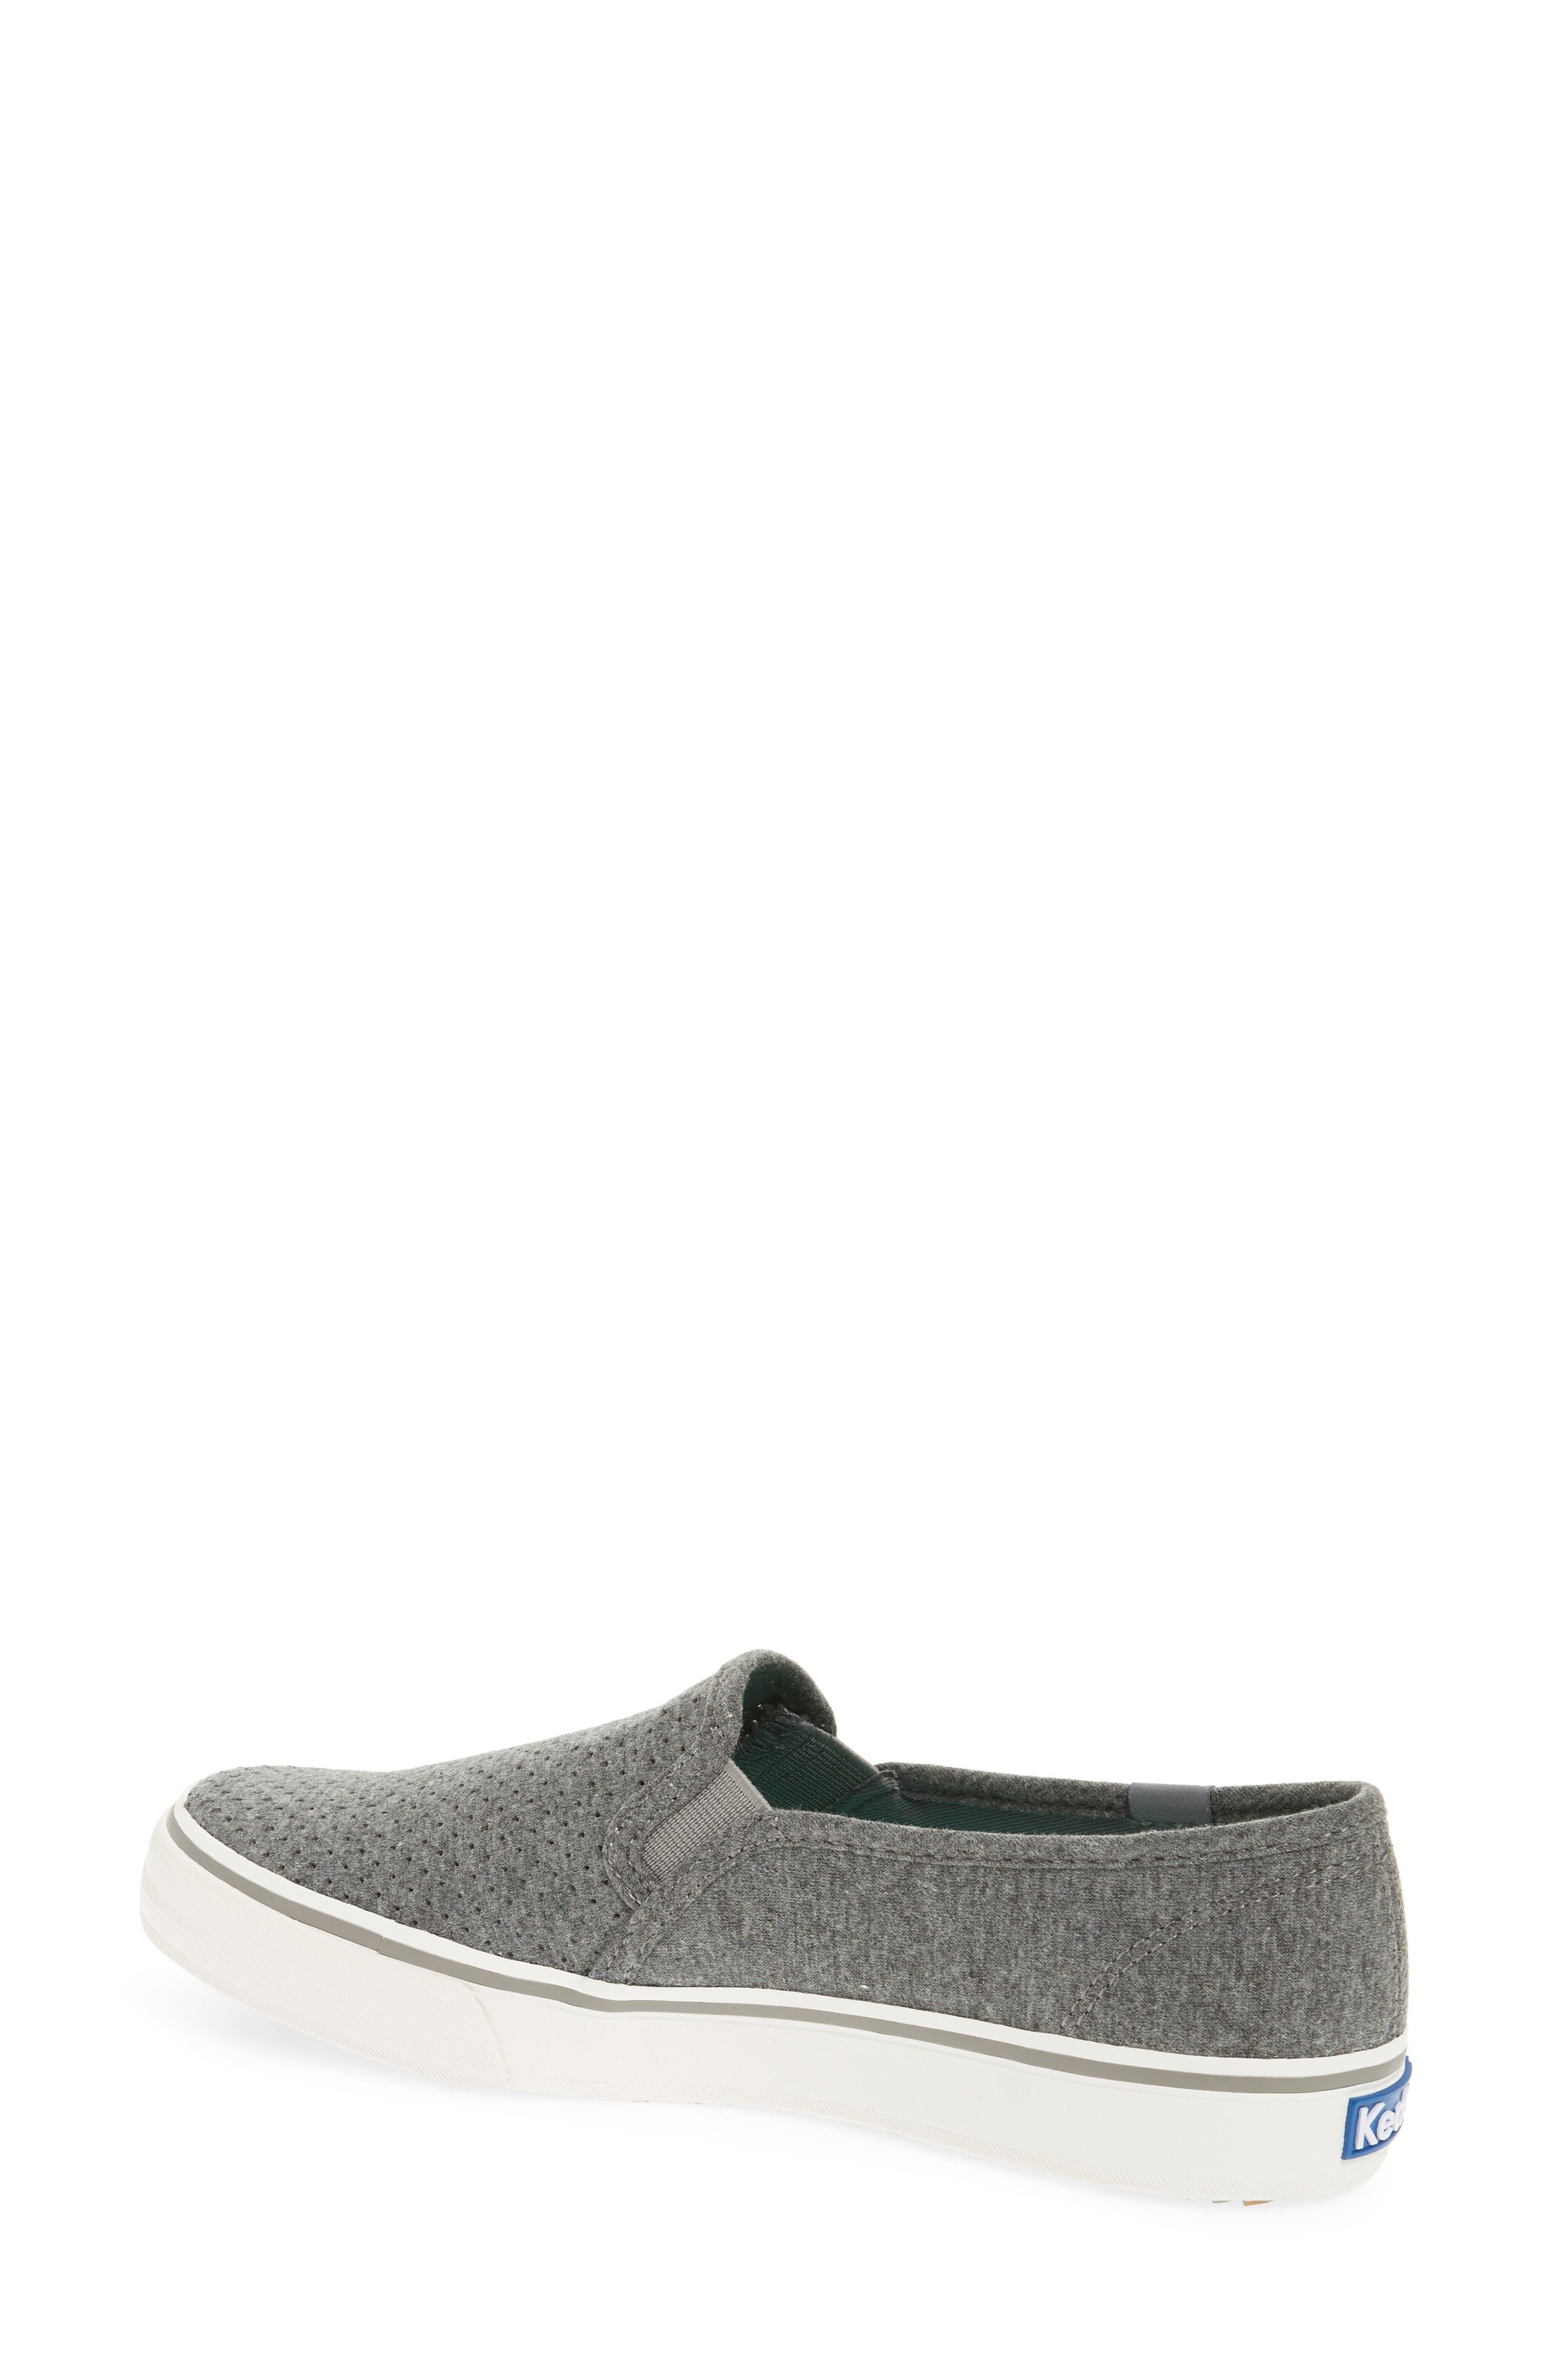 Double Decker Perforated Slip-On Sneaker,                             Alternate thumbnail 2, color,                             021